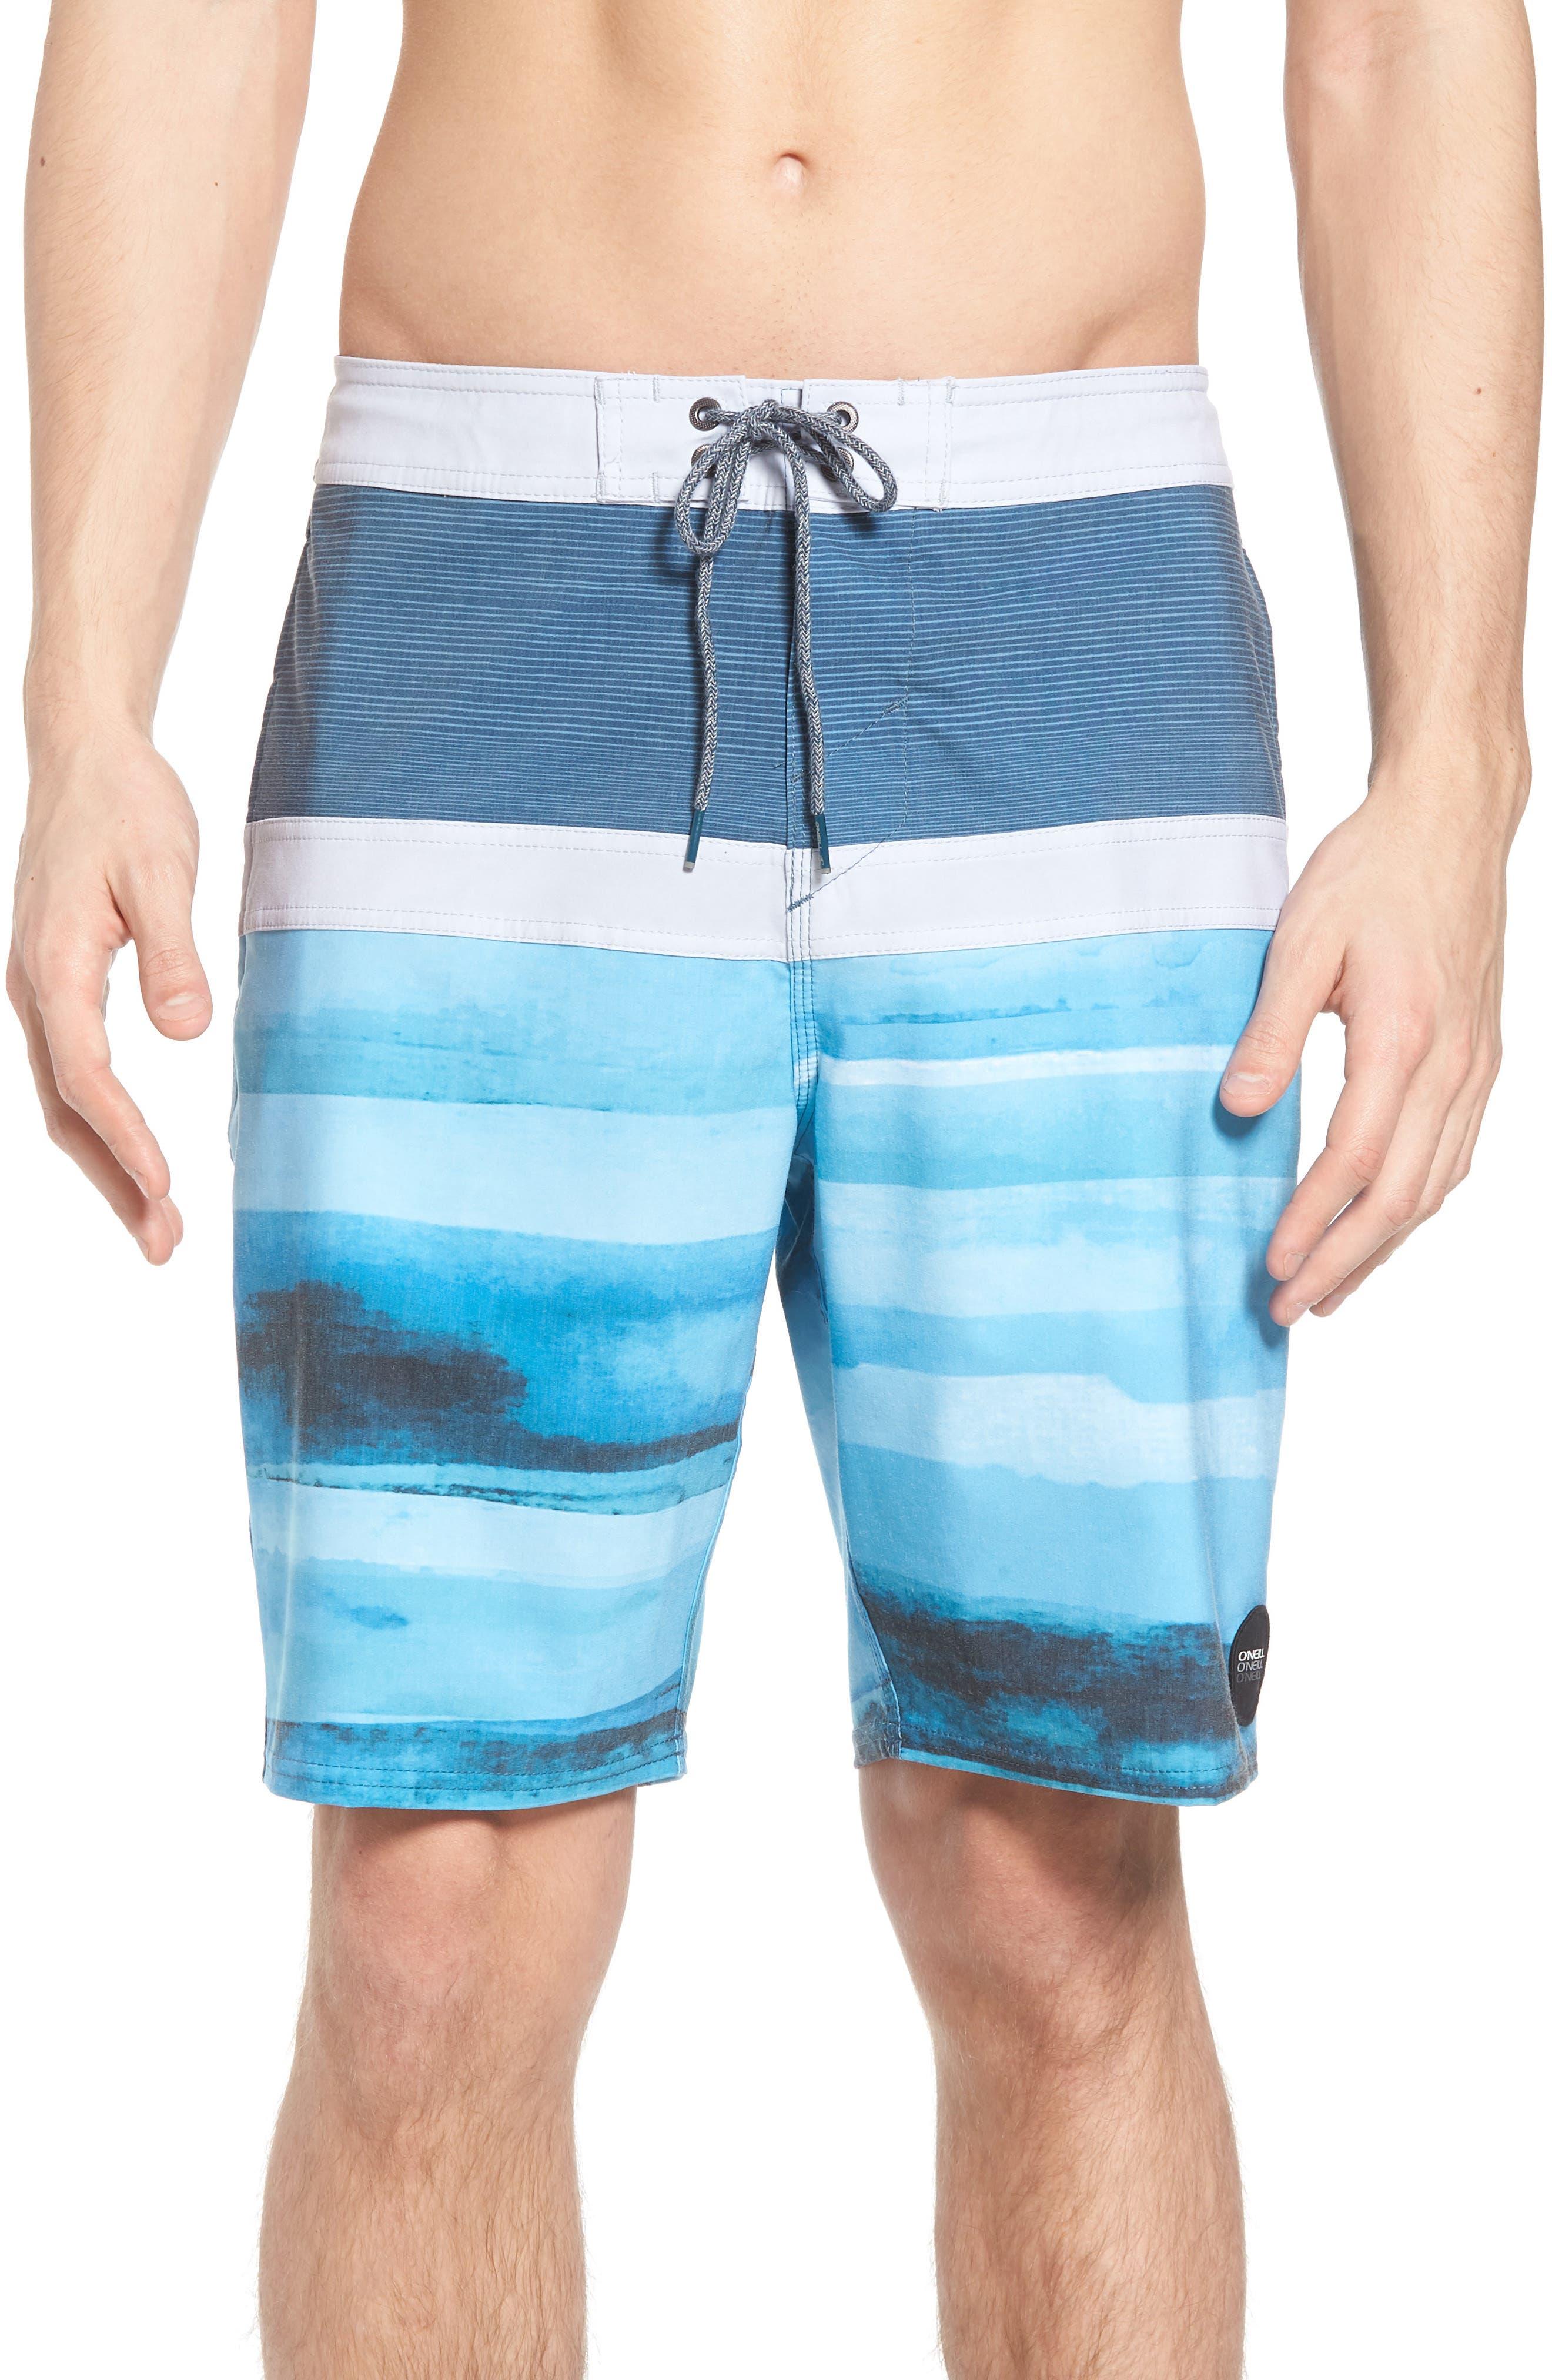 Breaker Cruzer Board Shorts,                         Main,                         color, Ocean